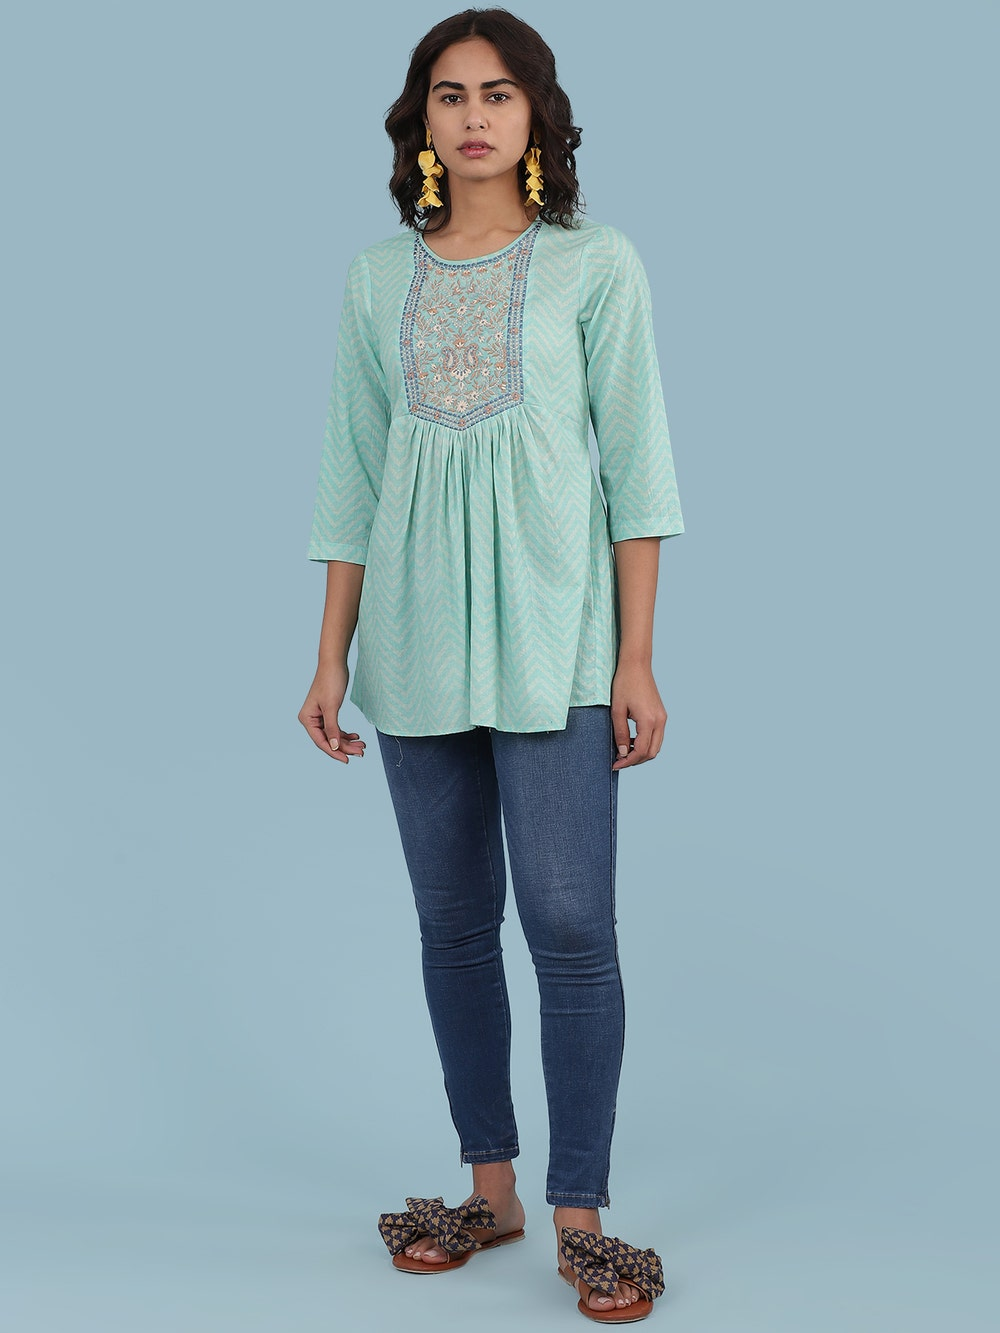 Turquoise Embroidered Kurti